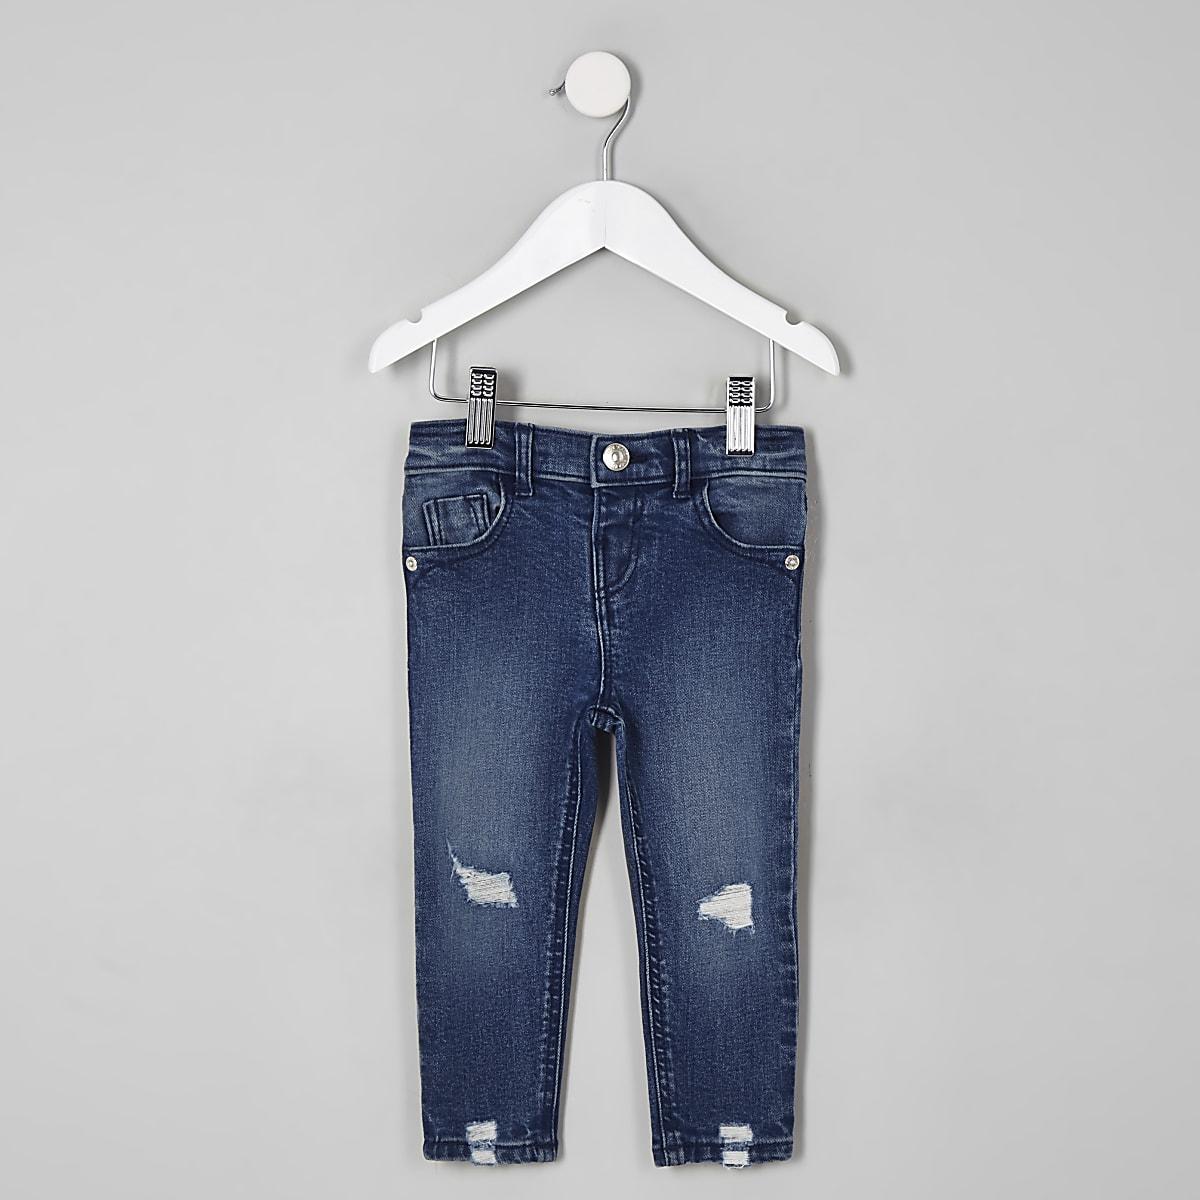 Mini - Amelie - Donkerblauwe wash ripped jeans voor meisjes